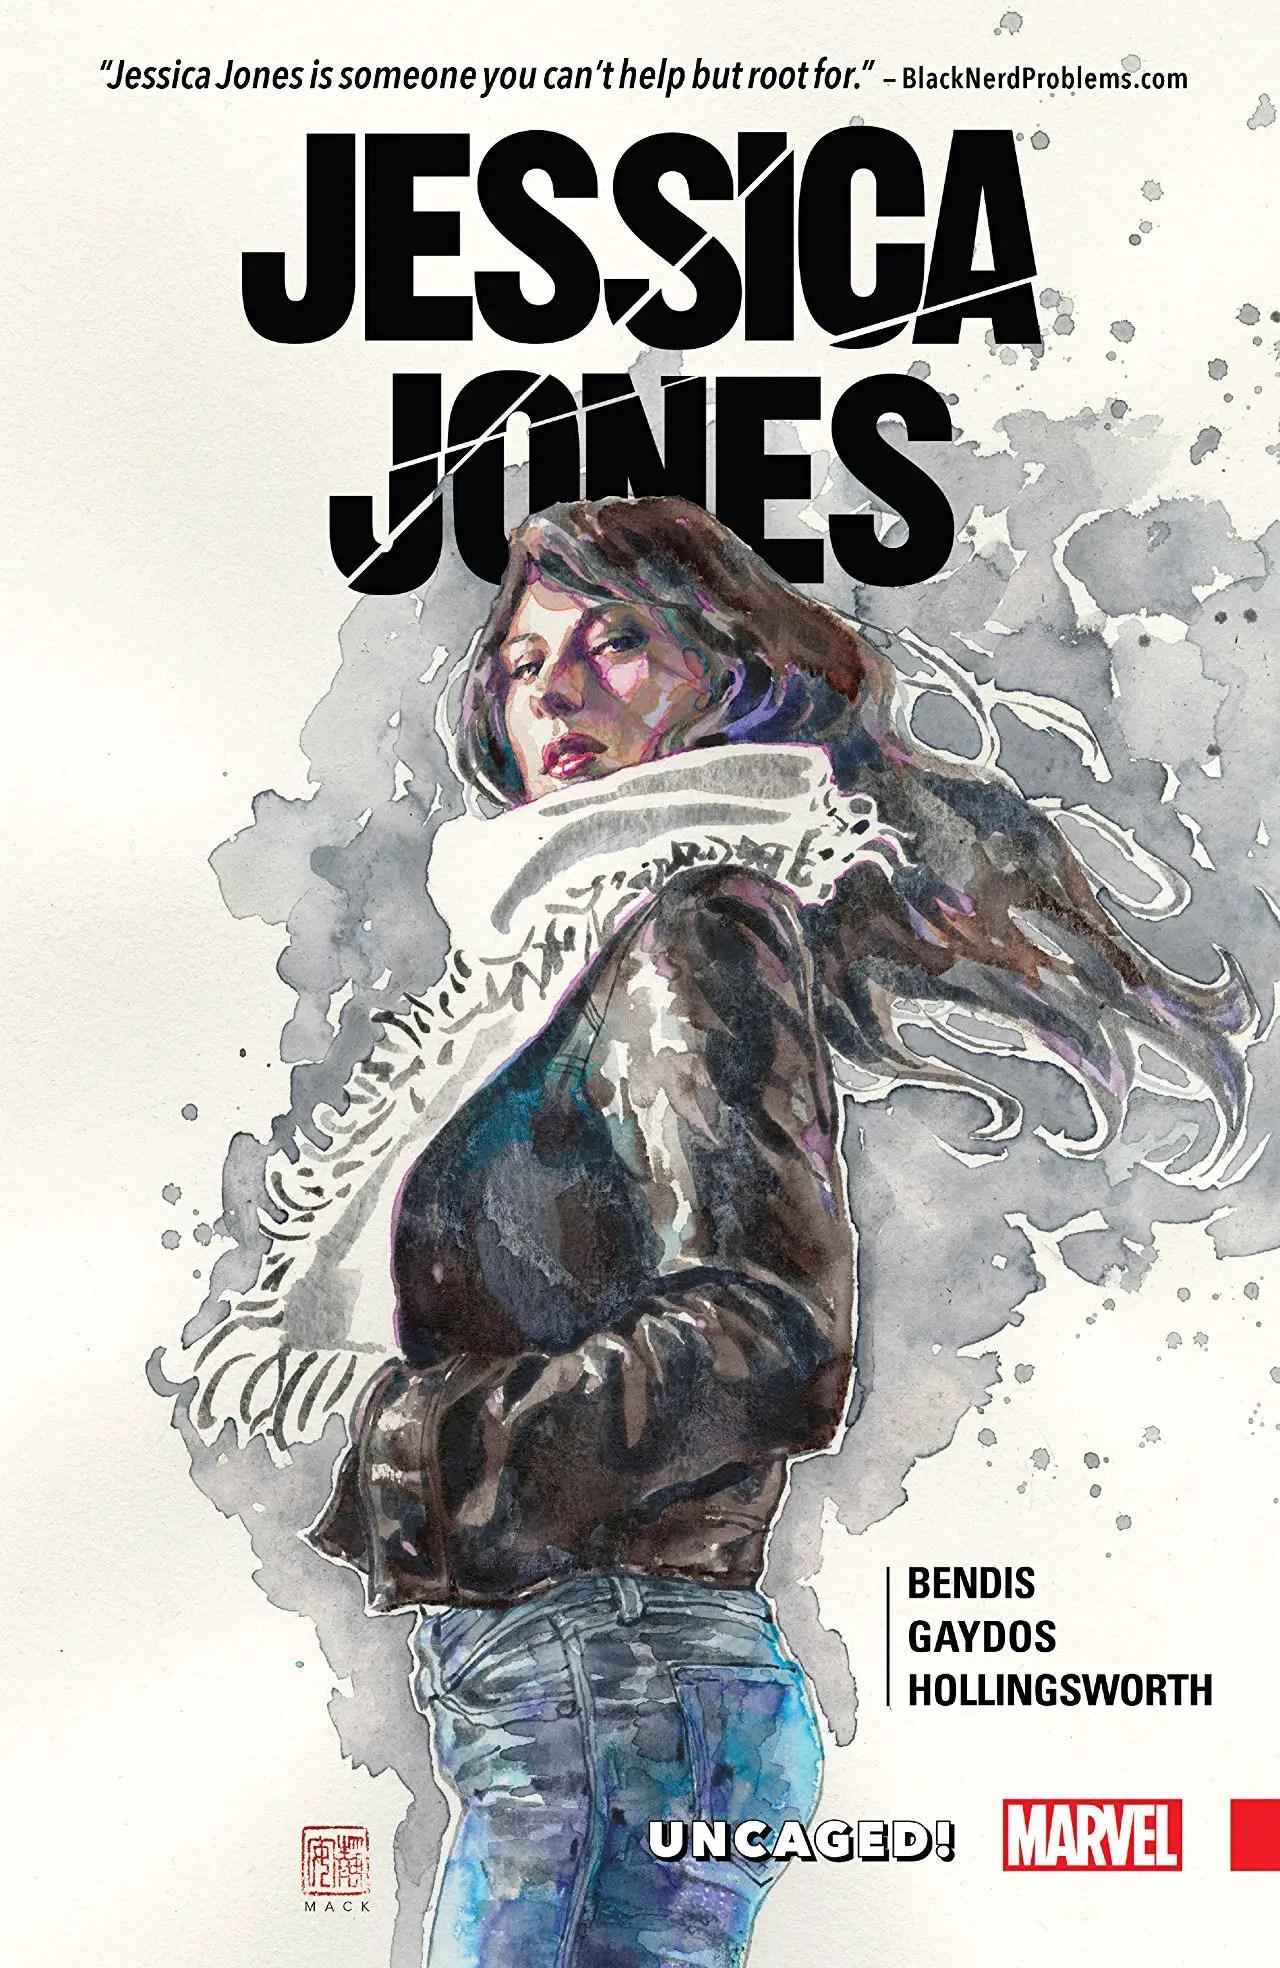 'Jessica Jones Vol. 1: Uncaged!' was worth the decade-long wait